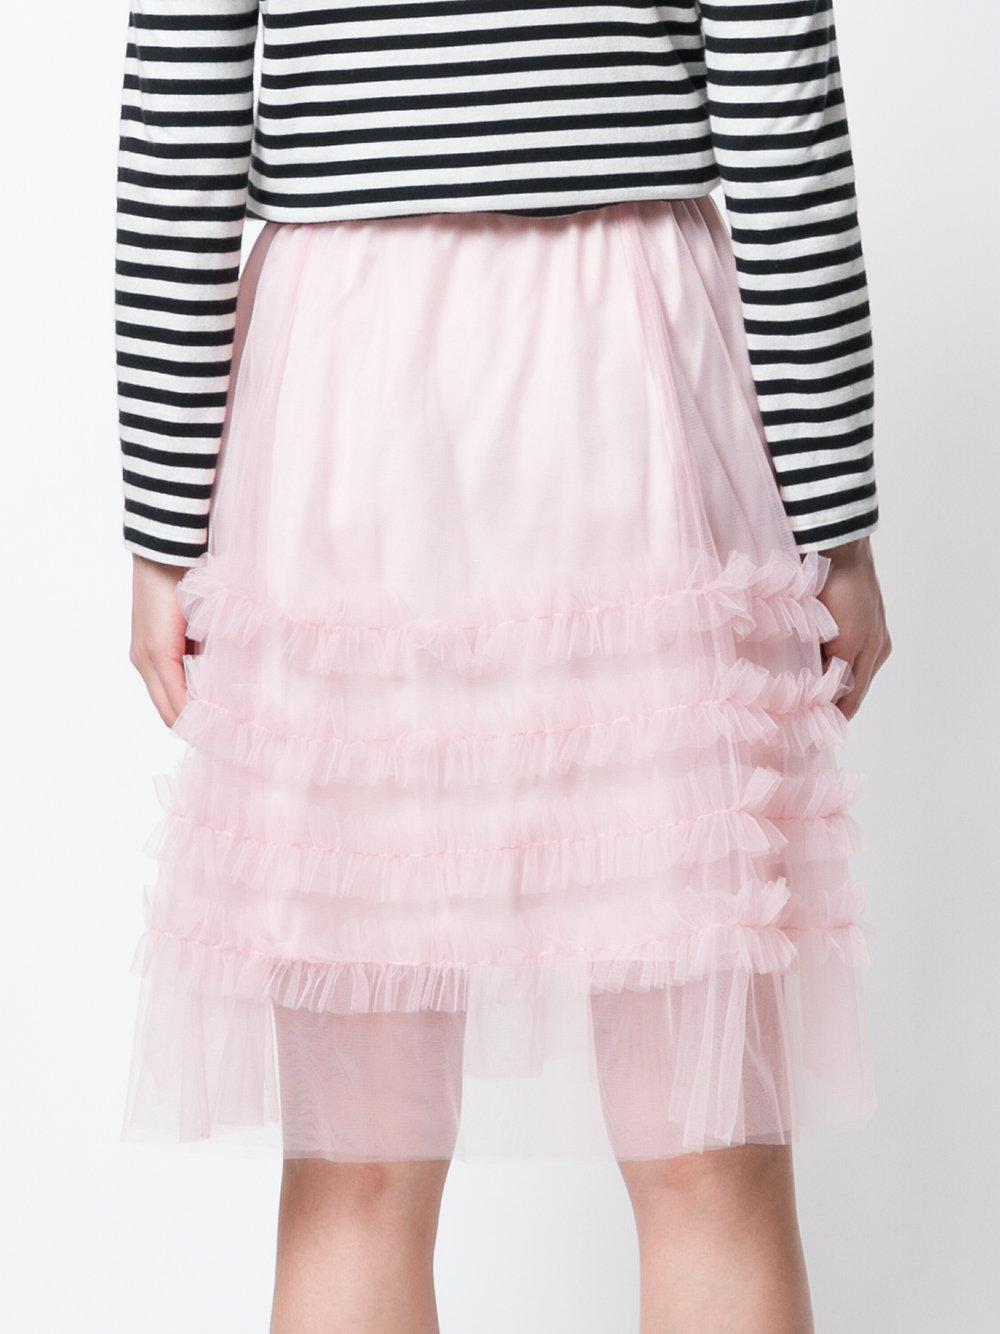 Sale 100% Guaranteed P.A.R.O.S.H. high-waisted ruffle skirt Clearance Enjoy mxBzCzL8